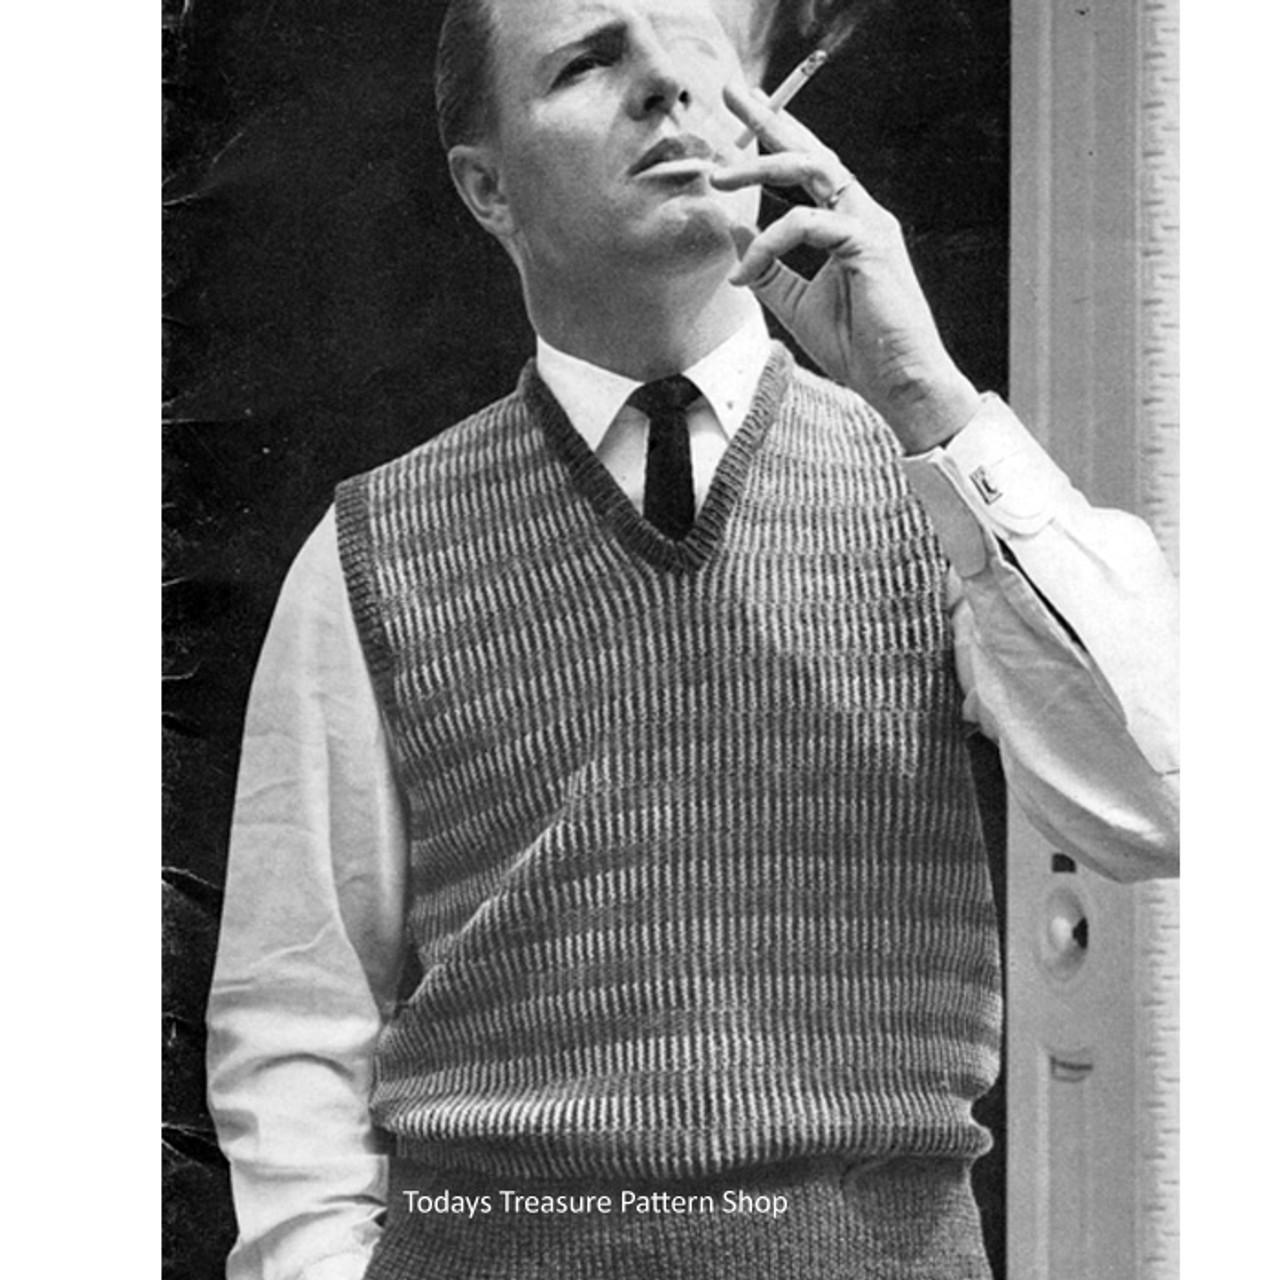 Spinnerin Mens Sleeveless Pullover Knitting Patter